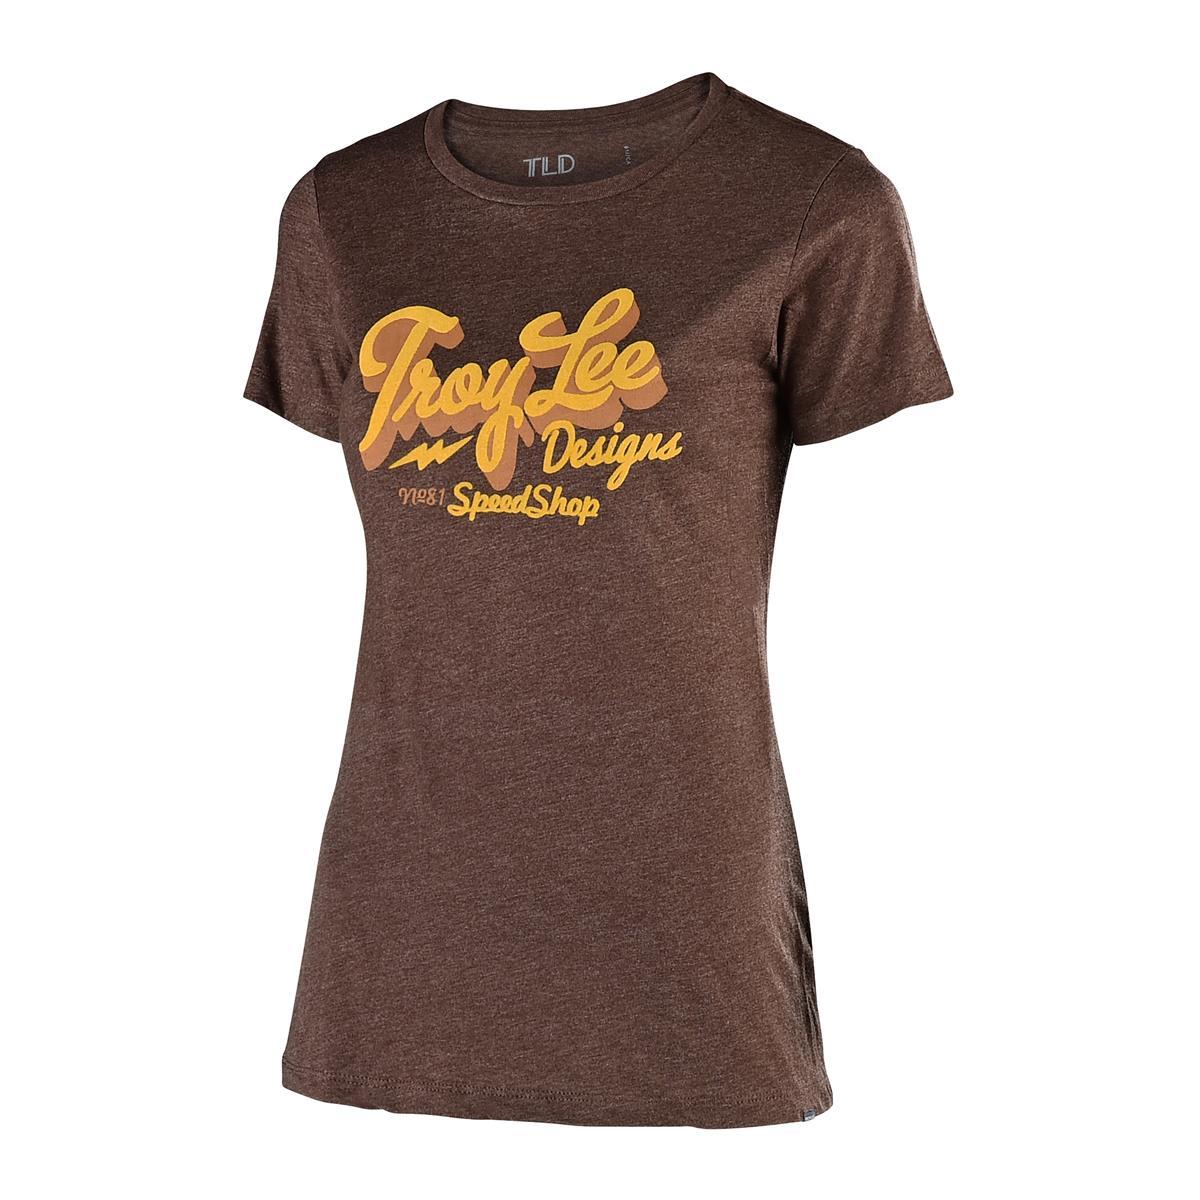 Troy Lee Designs Girls T-Shirt Vintage Speed Shop Espresso